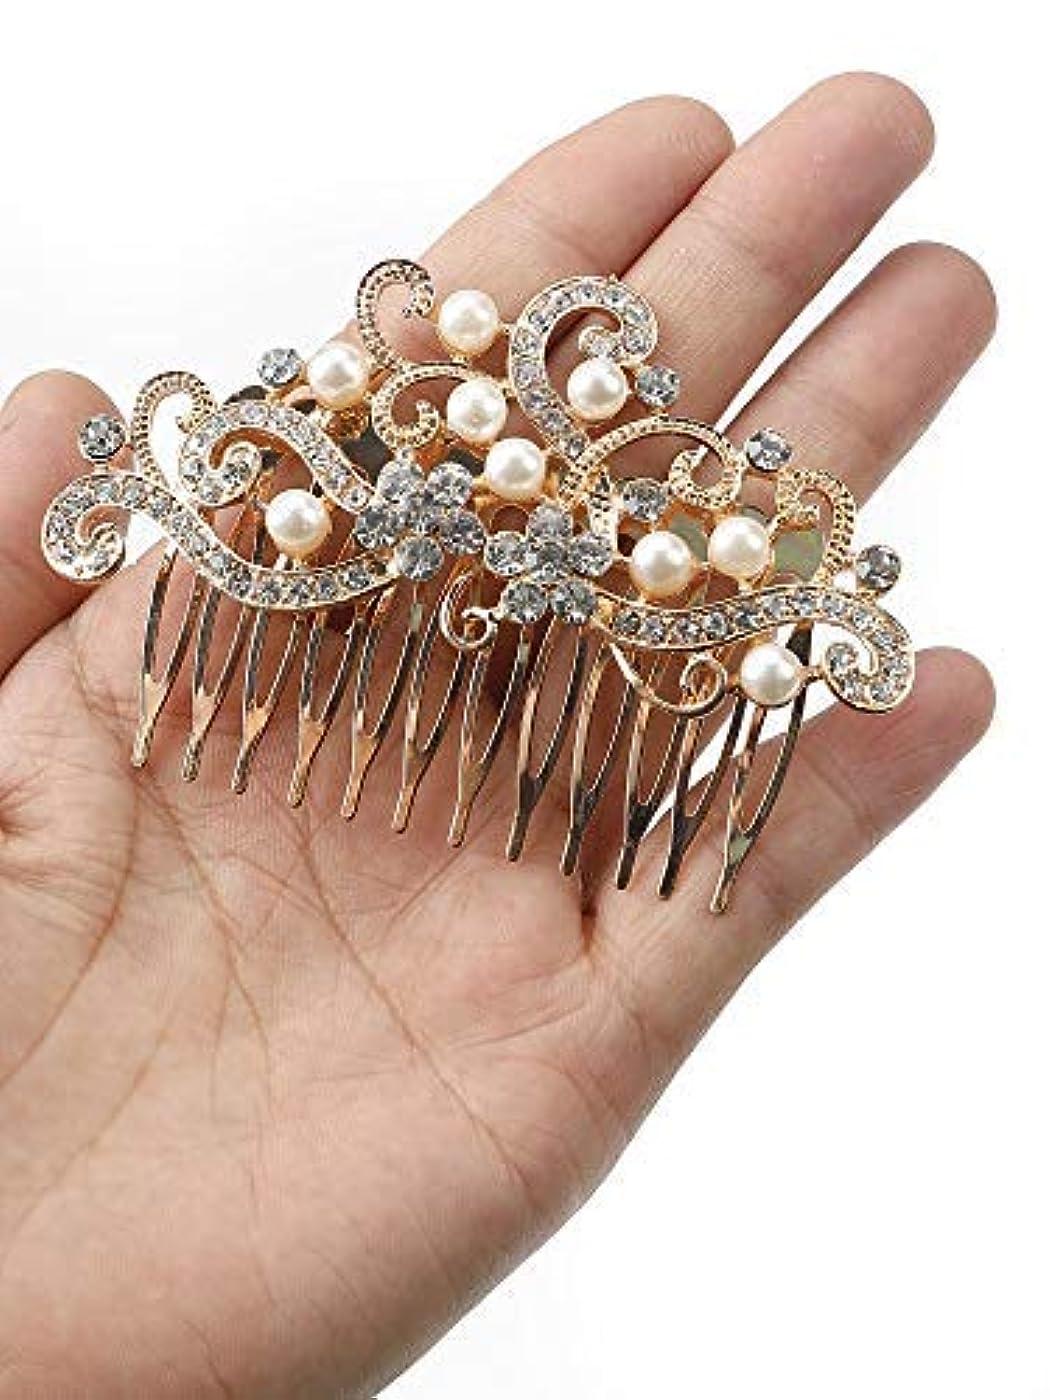 FXmimior Bridal Women Vintage Wedding Party Crystal Rhinestone Vintage Hair Comb Hair Accessories (GOLD) [並行輸入品]